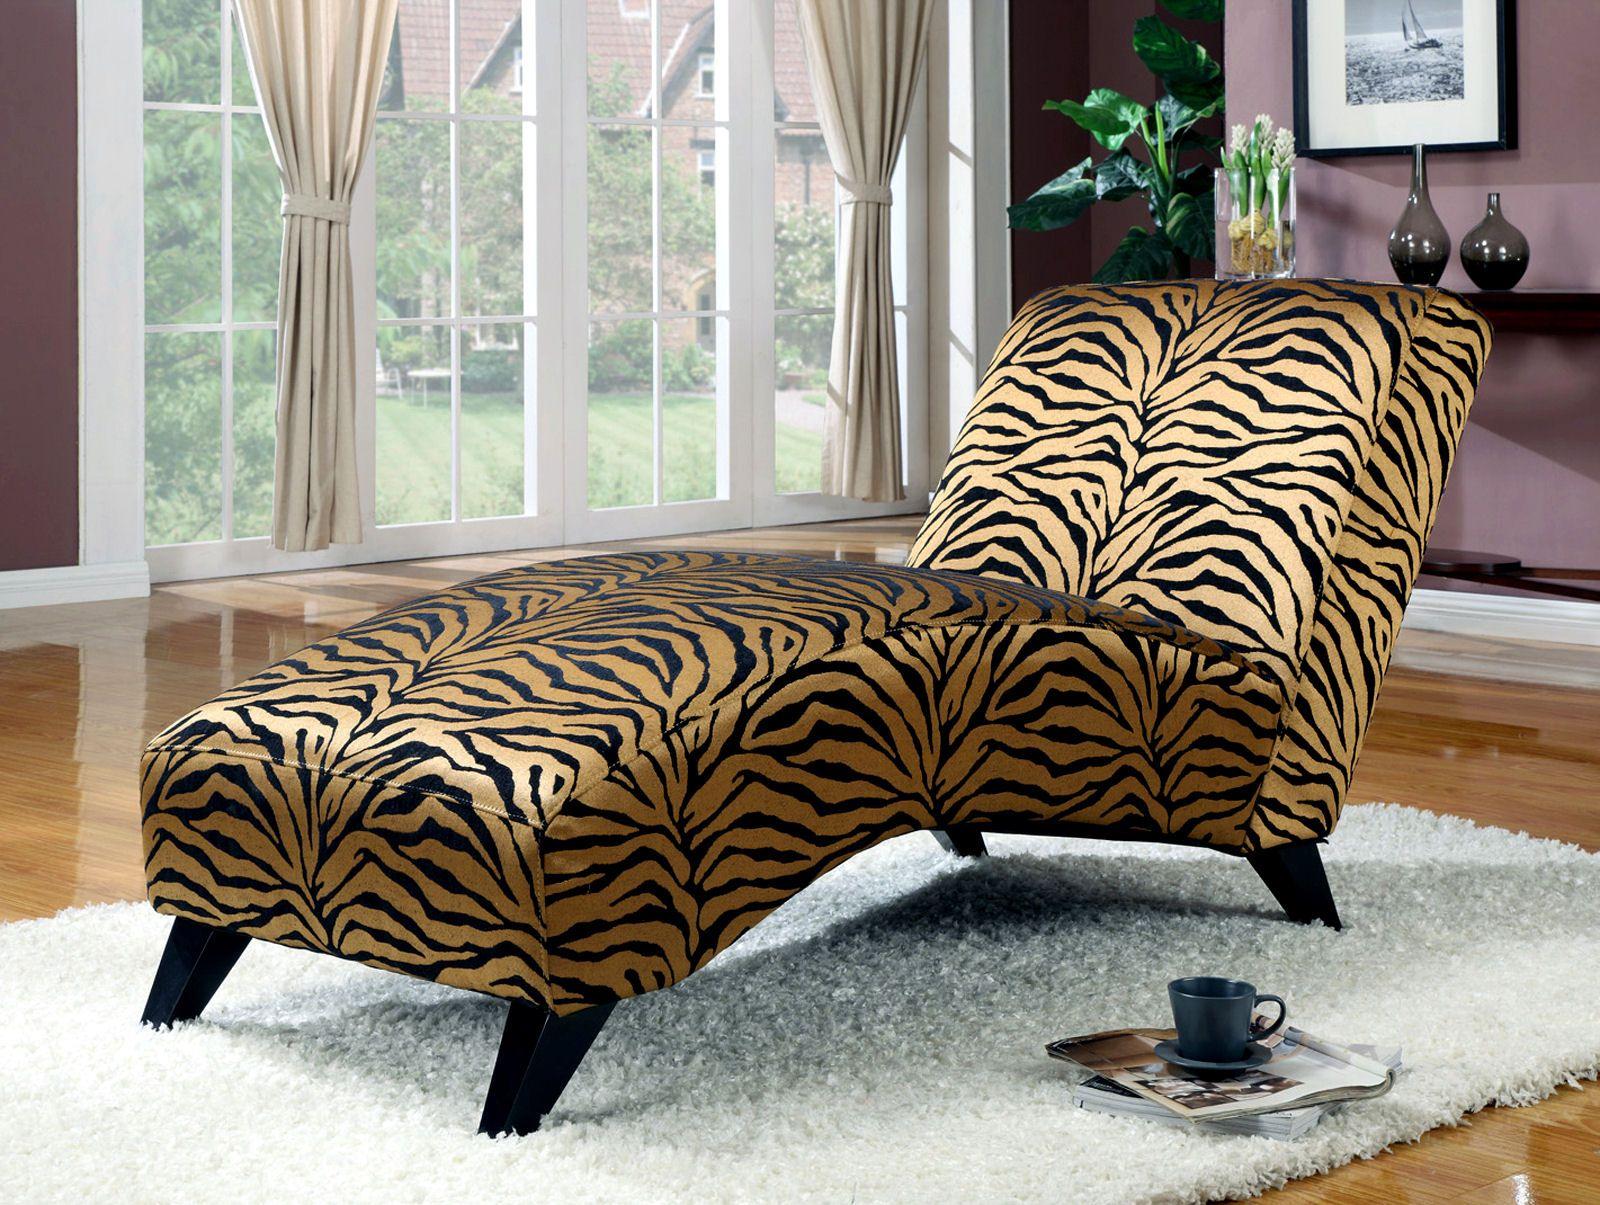 chaise lounge safari chaise lounge animal print wild about